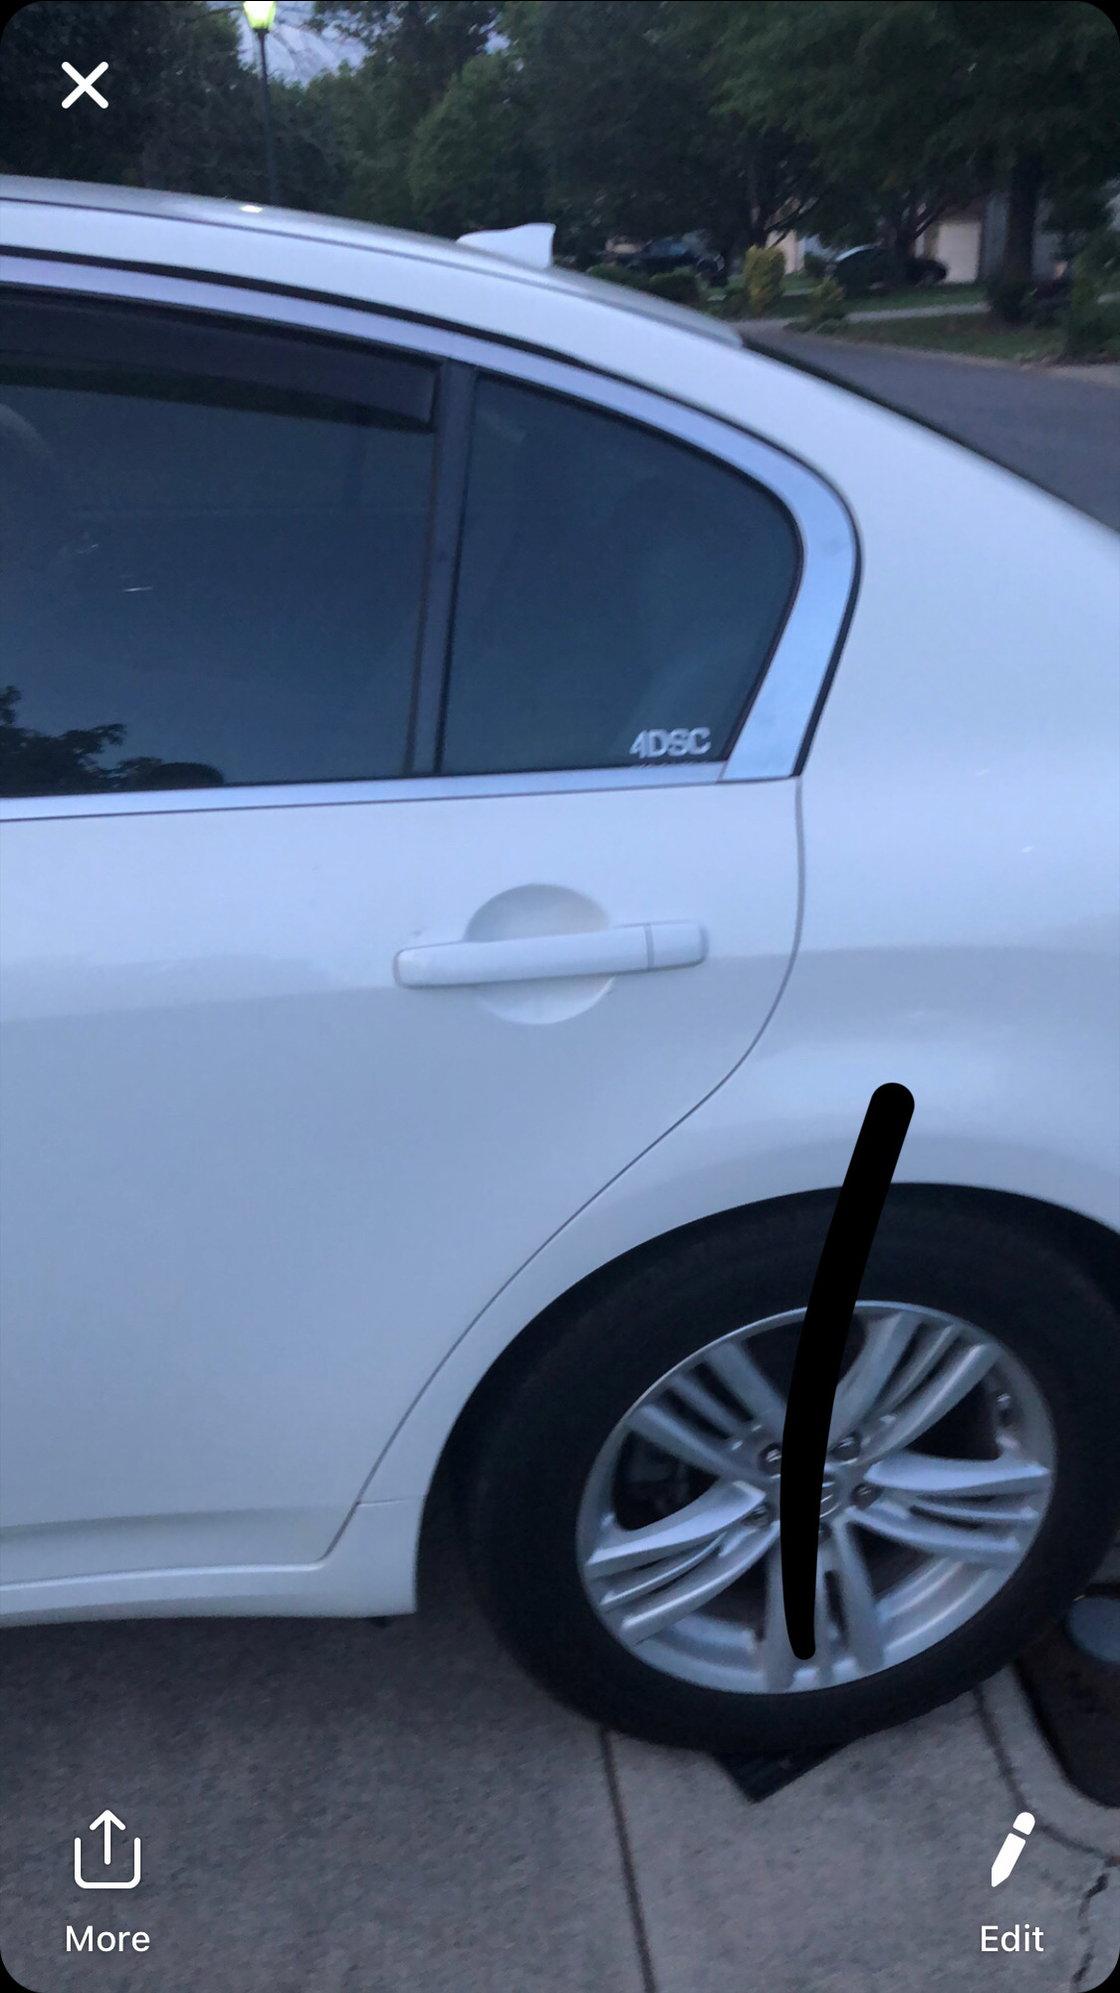 New 37 sedan owner - MyG37